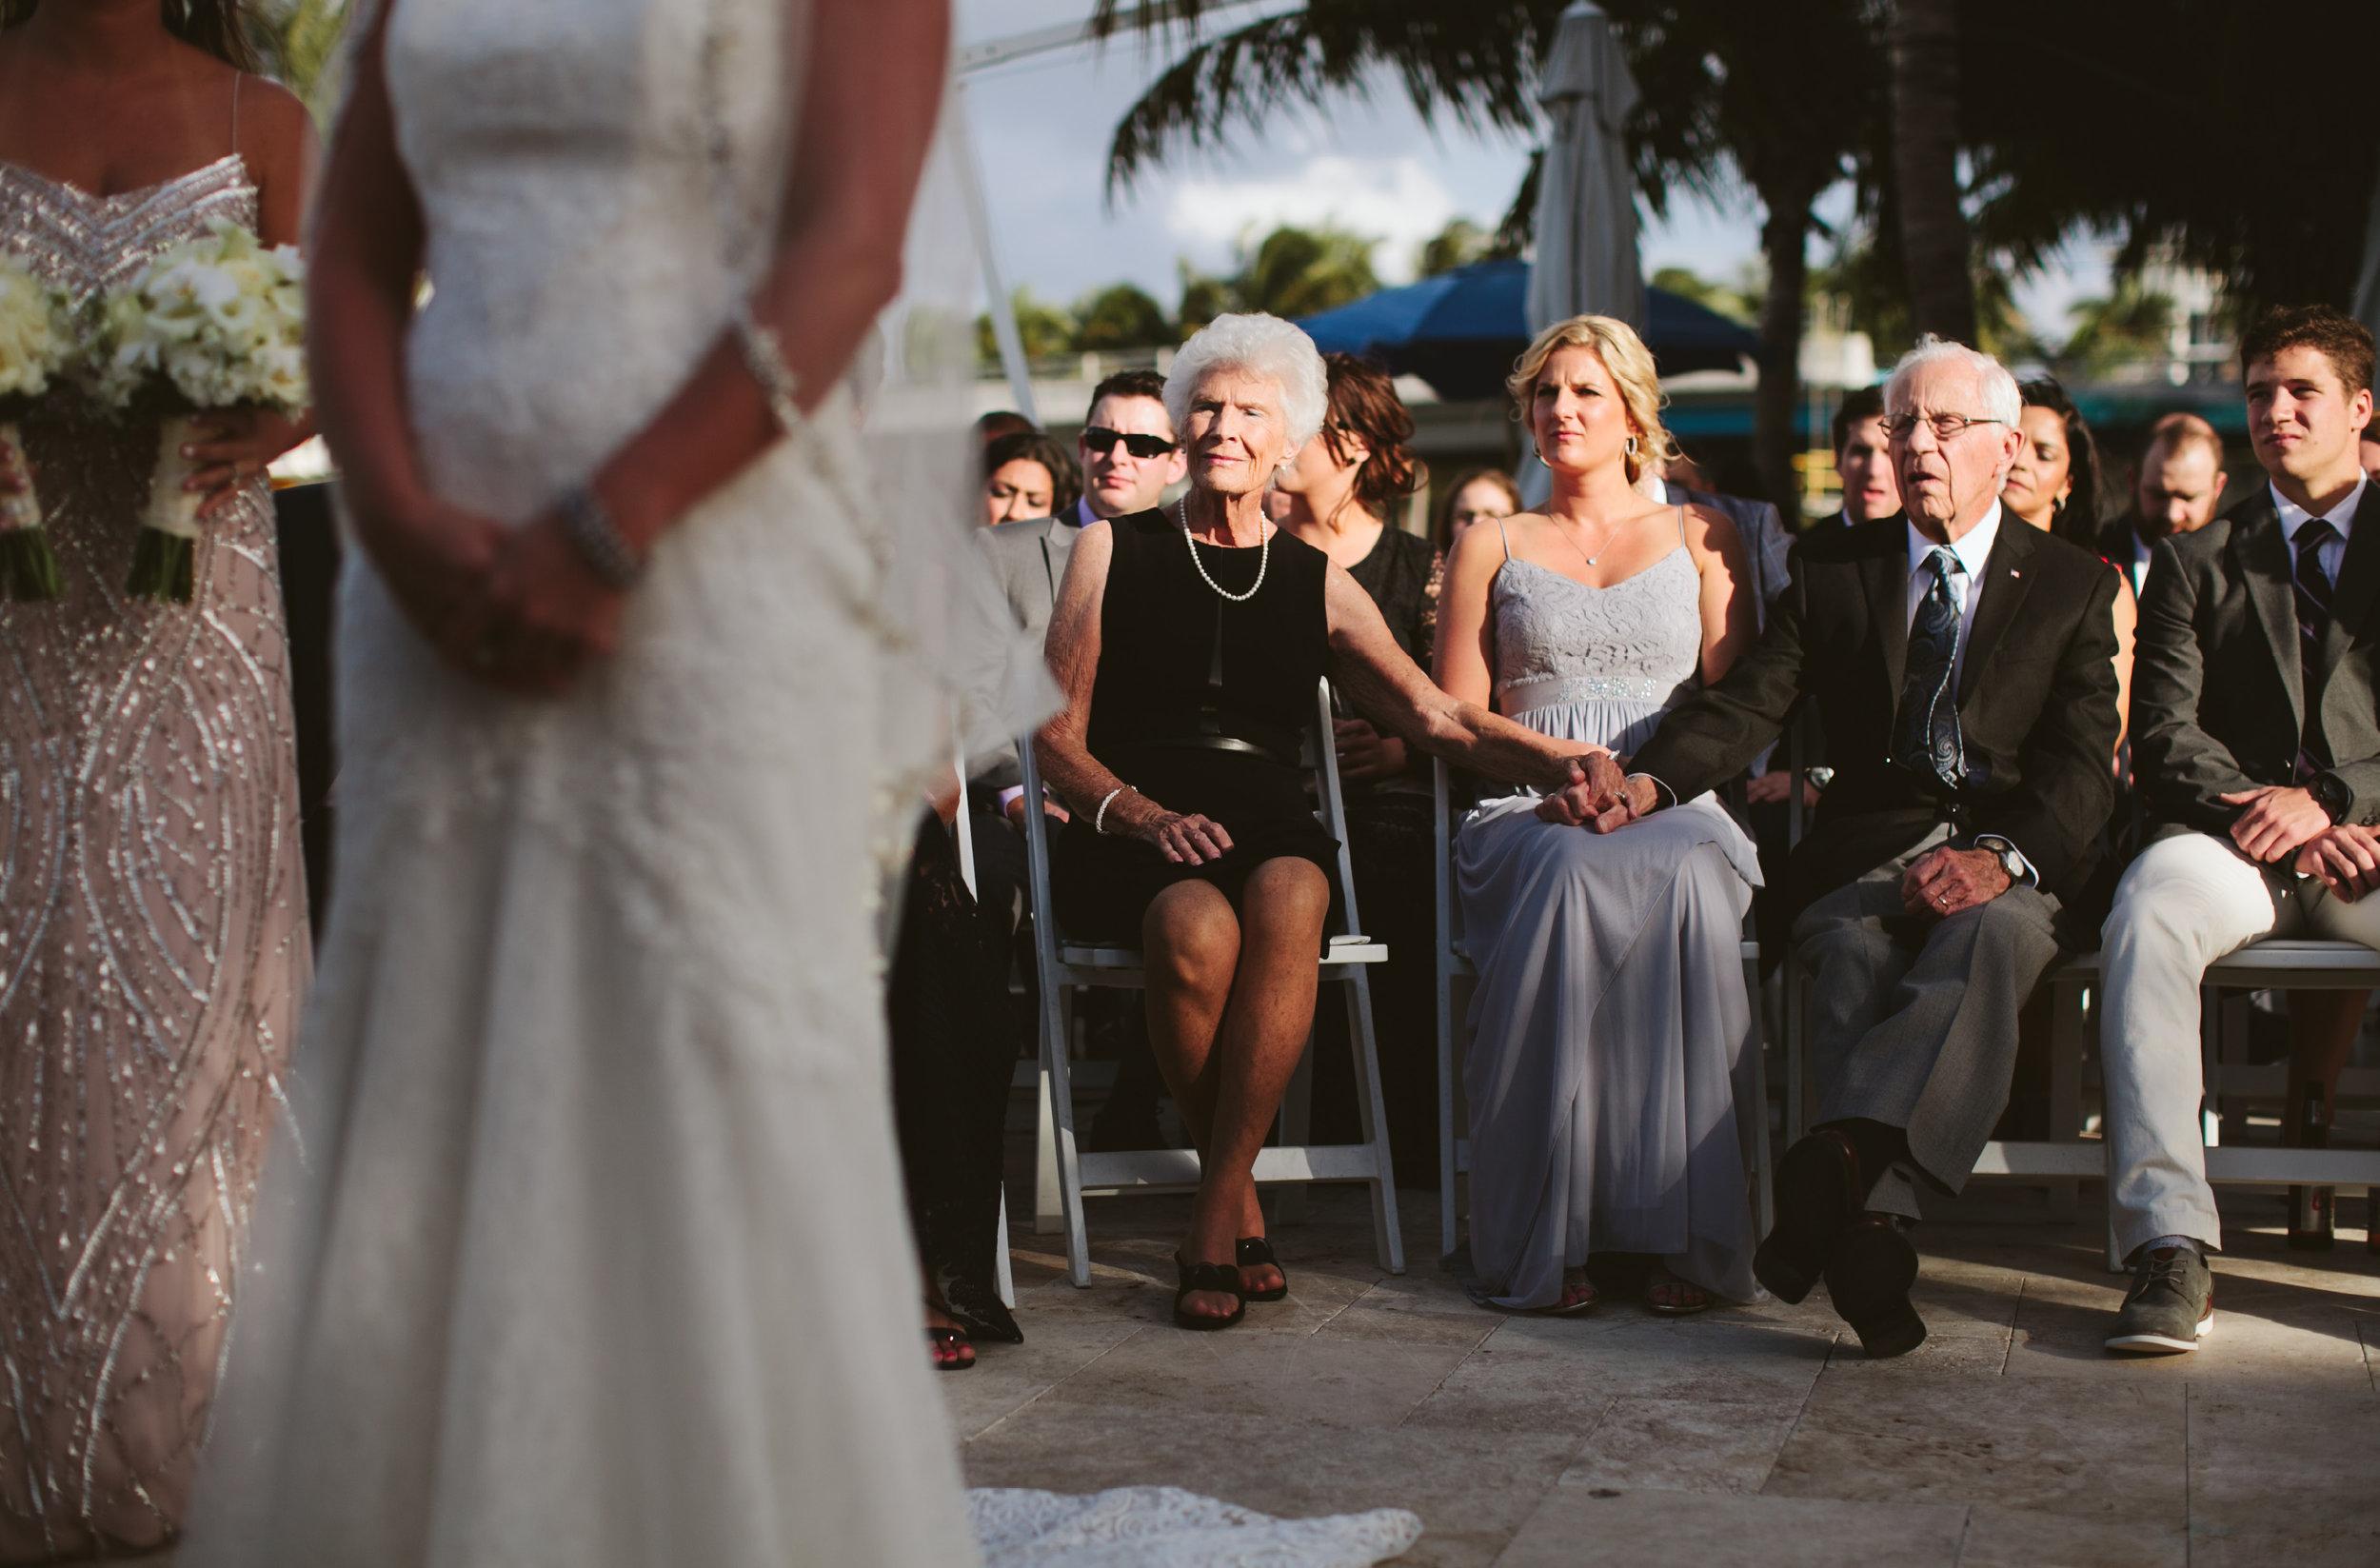 Kim + John's Wedding at the Waterstone Hotel in Boca Raton53.jpg